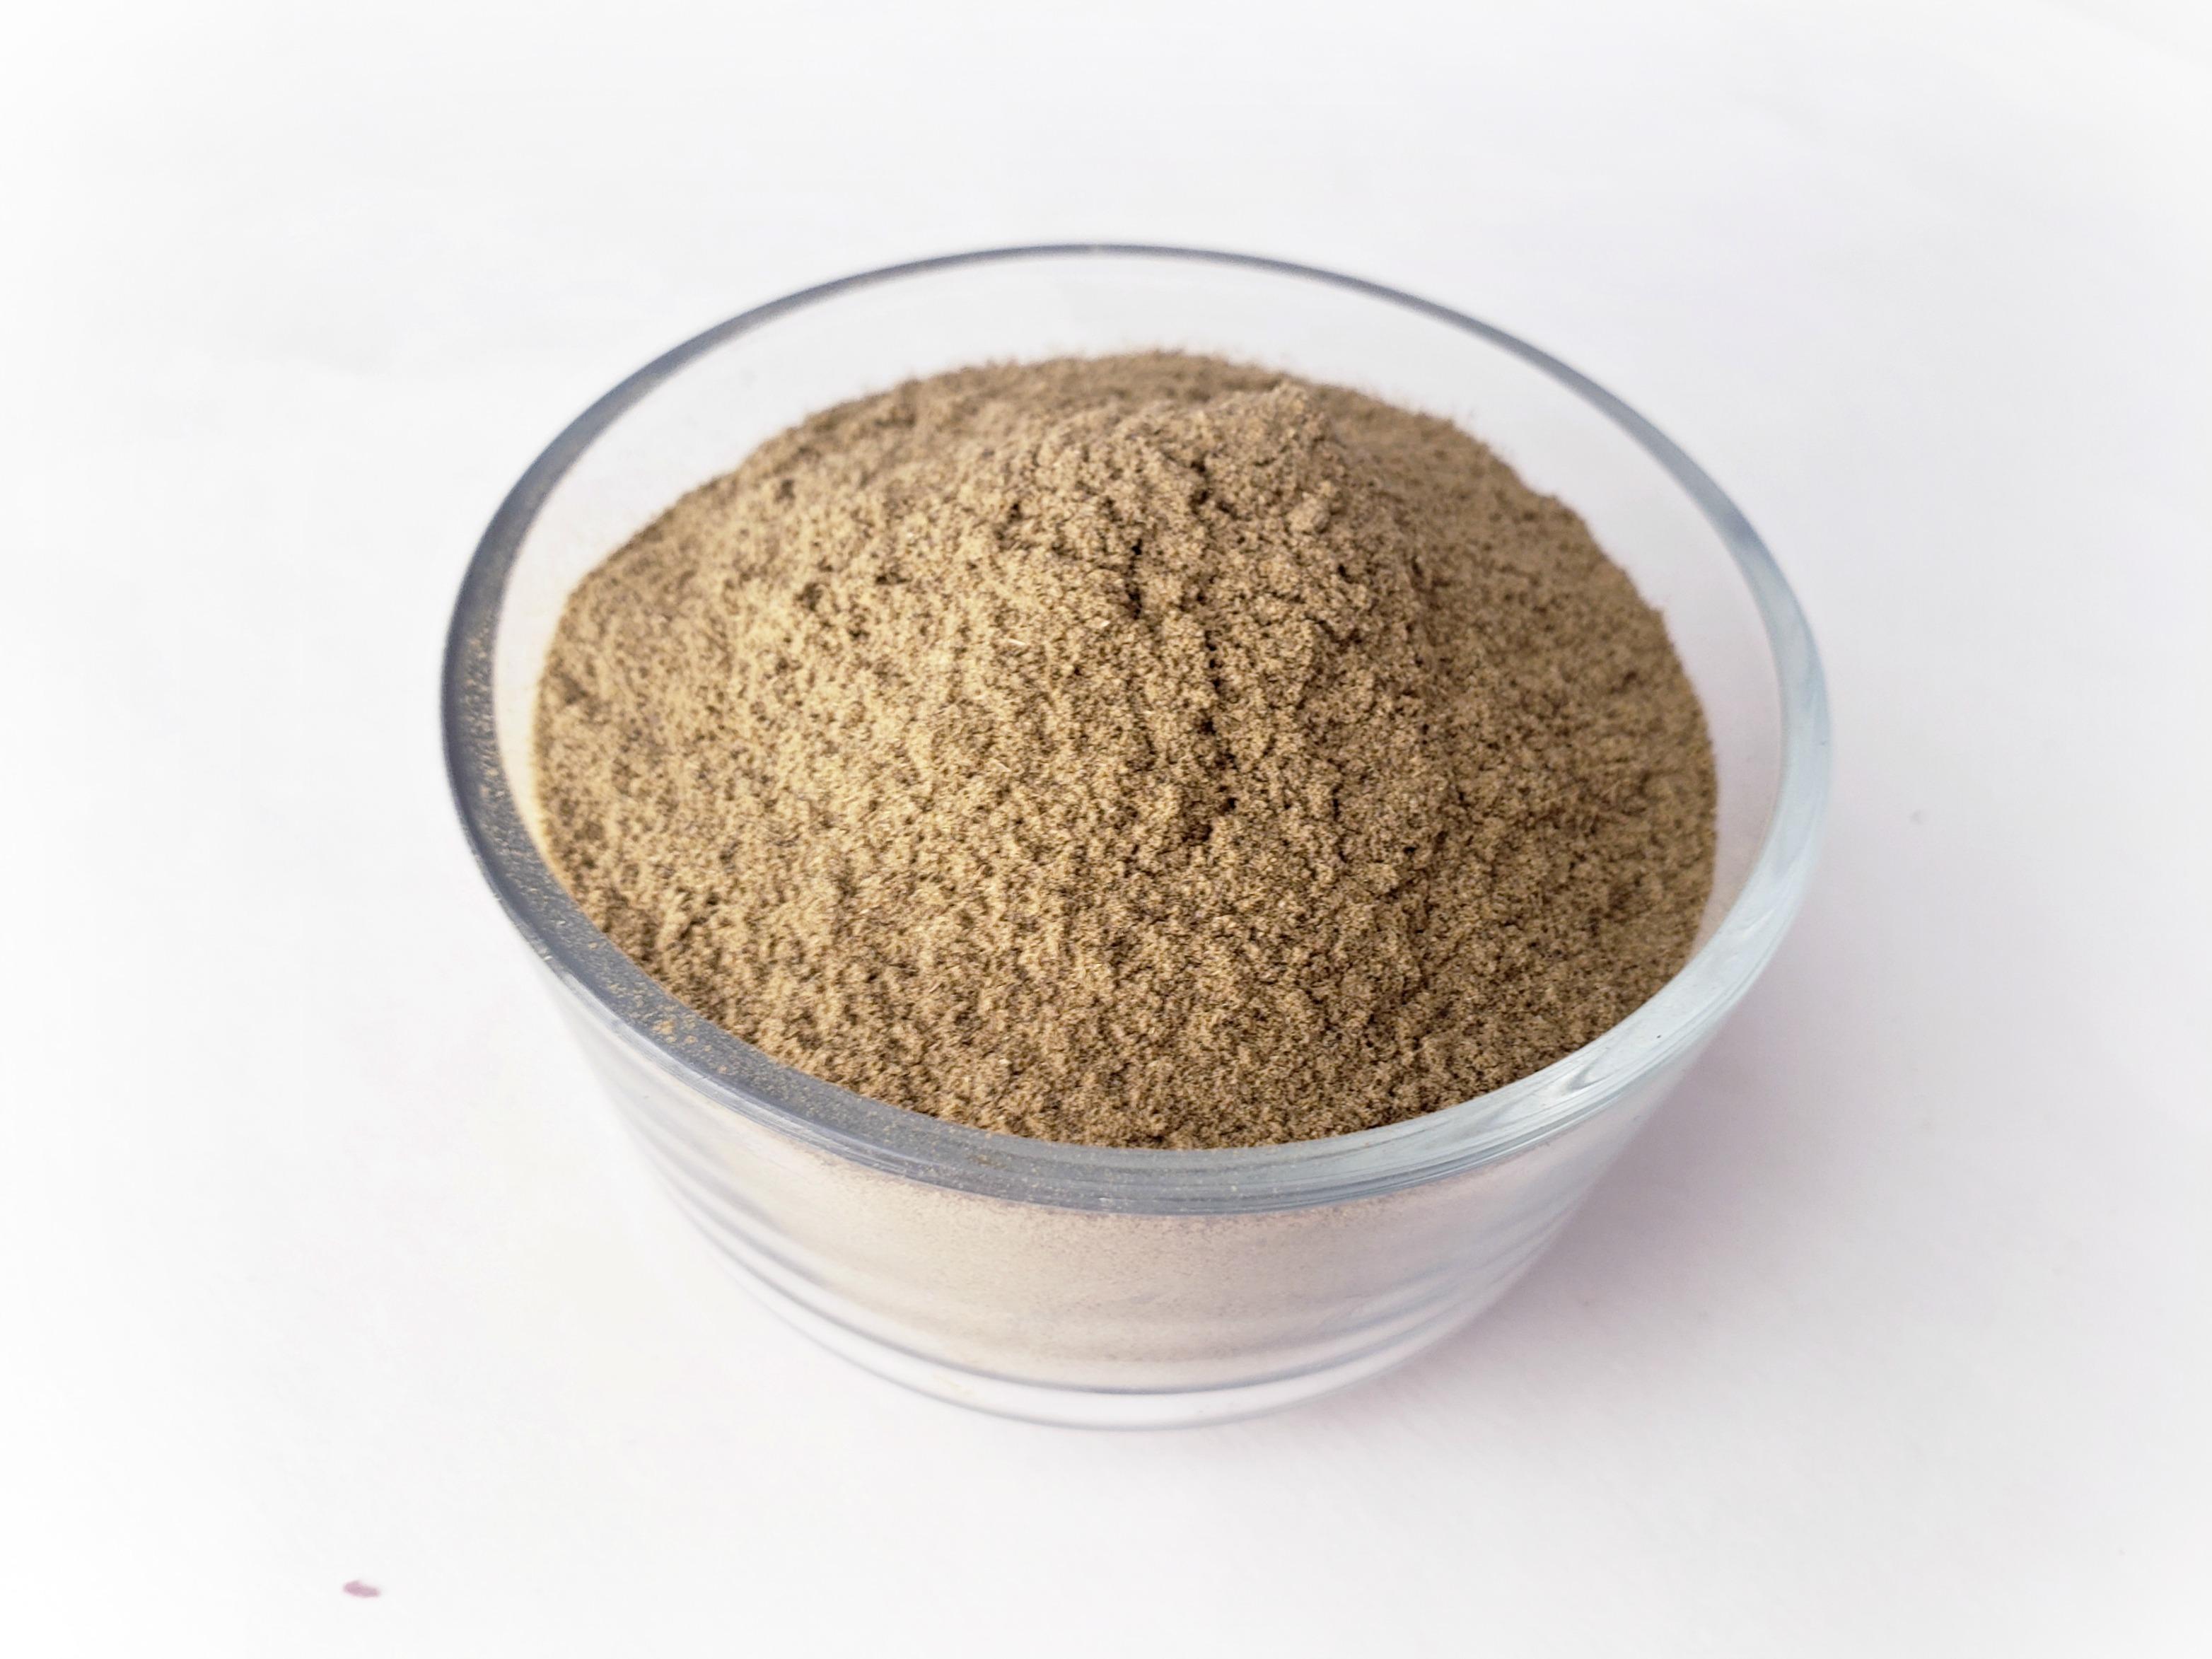 Mimosa Pudica (Sensitive Plant) Herb Powder